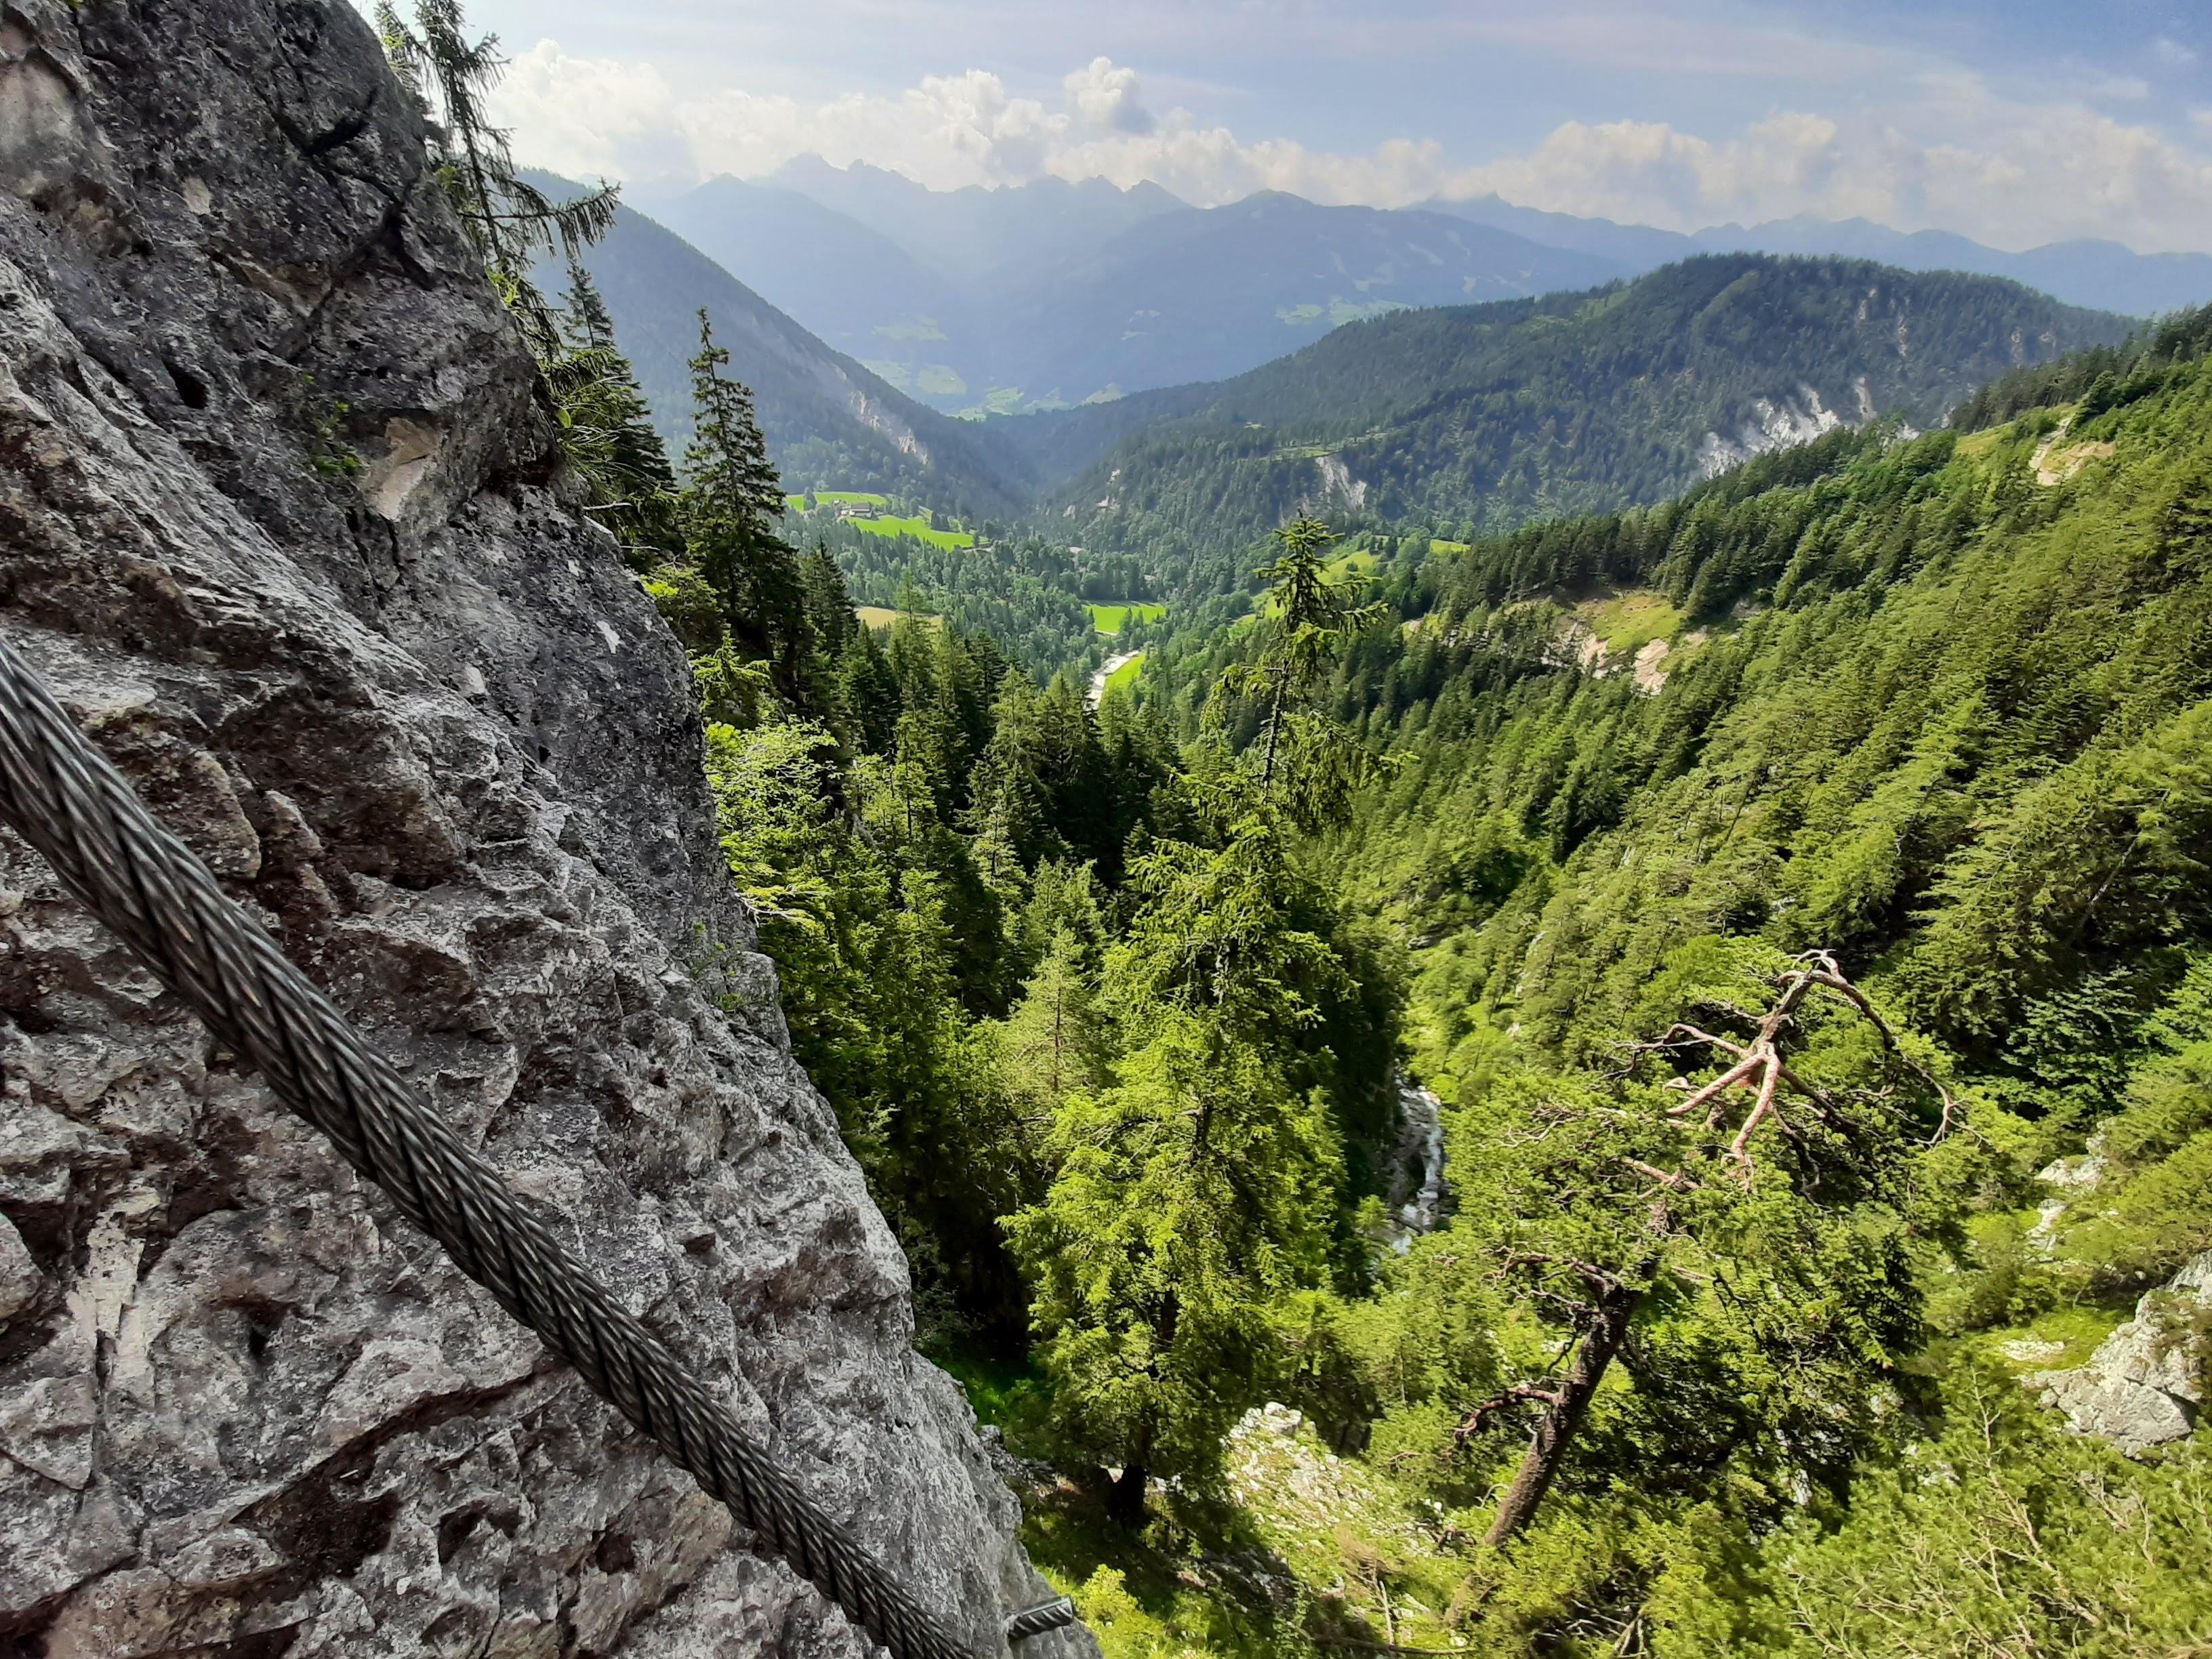 Alpy Salzburskie, Ramsau am Dachstein: via ferrata Hias